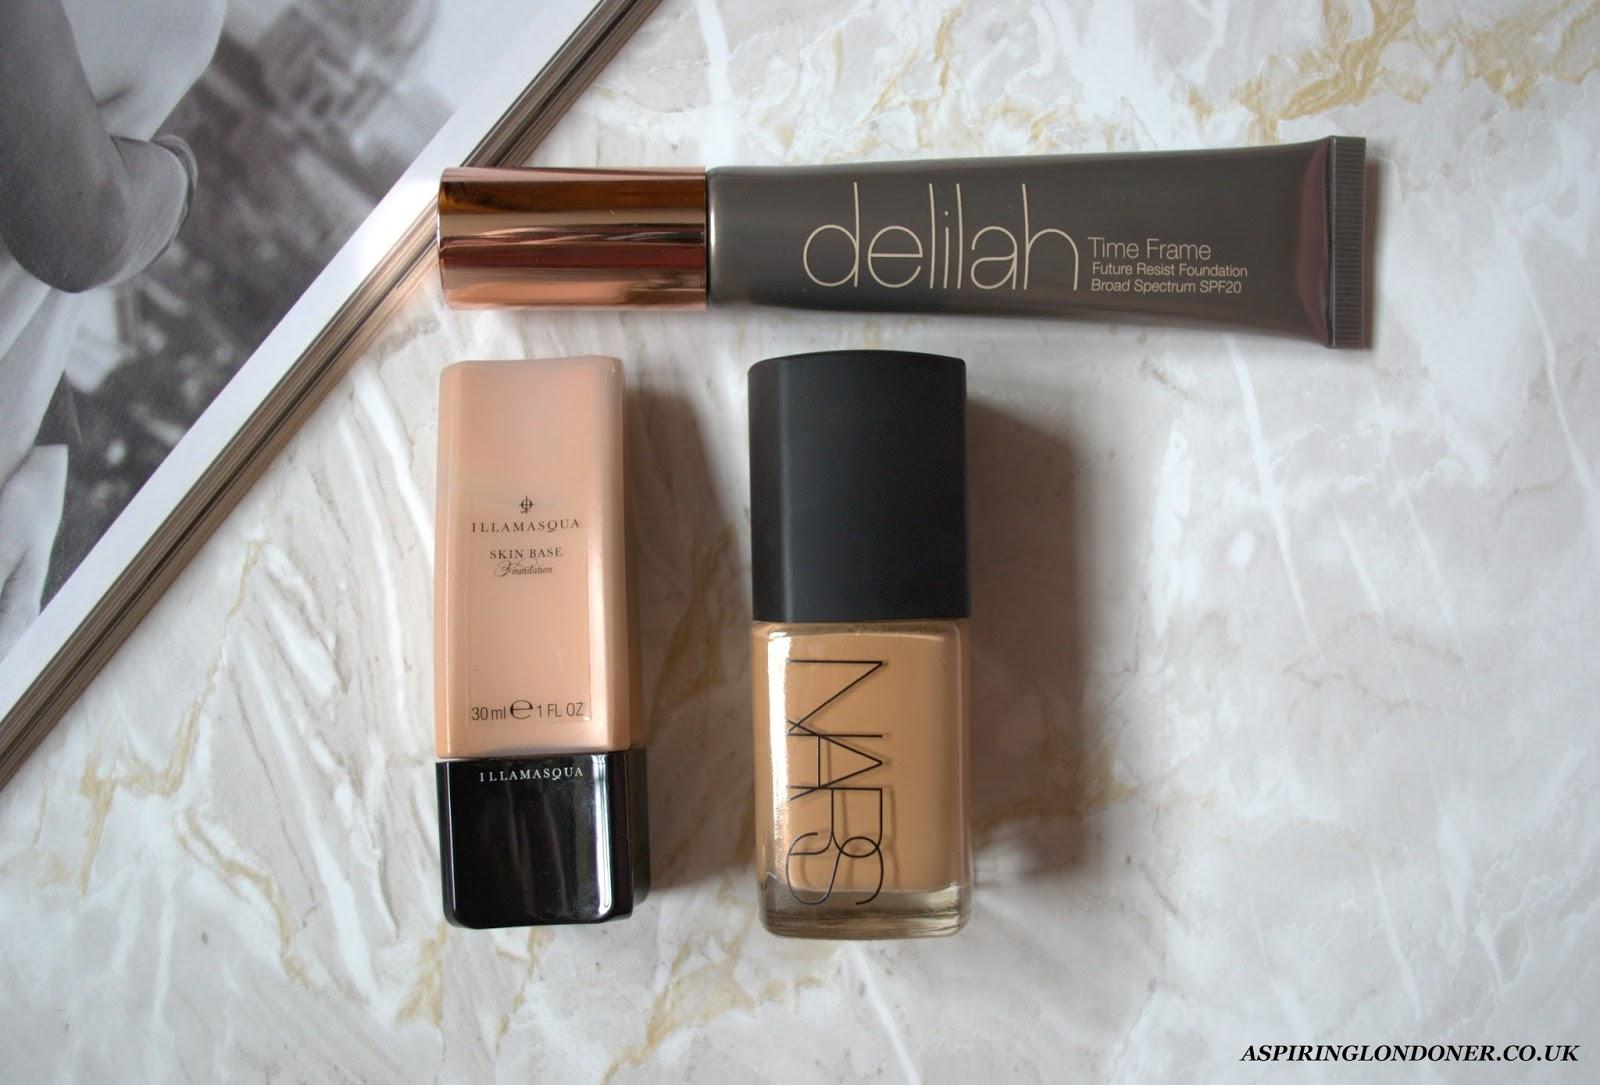 Best Foundations For Natural Dewy Finish ft NARS, Illamasqua, Delilah - Aspiring Londoner